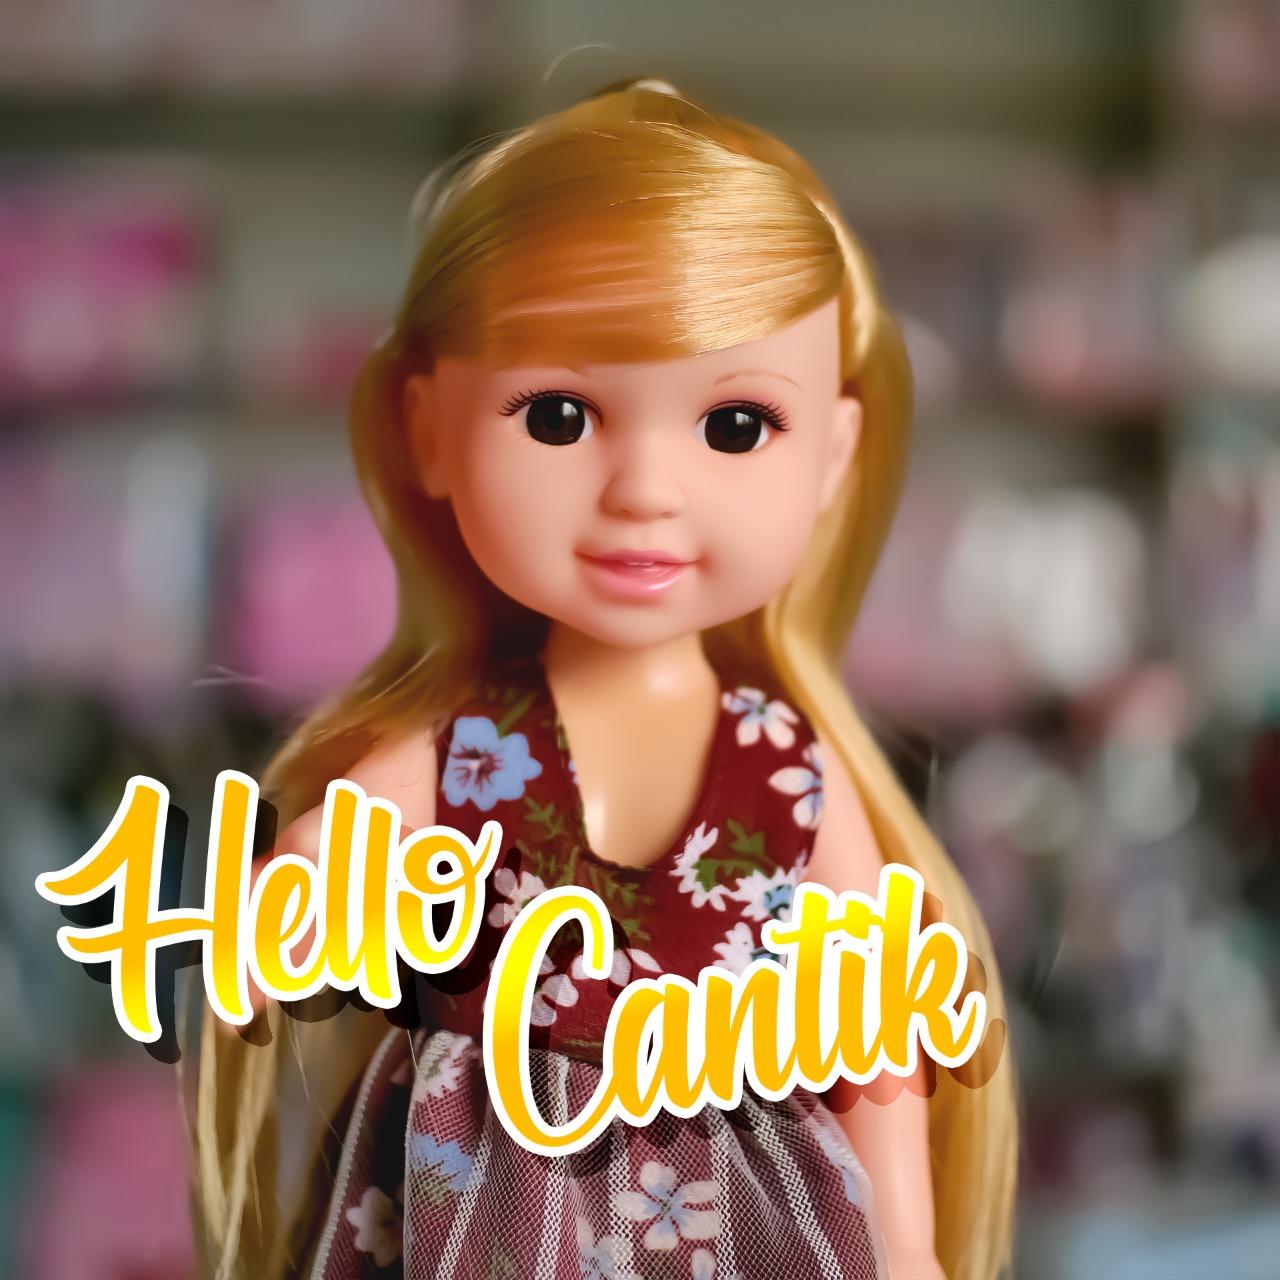 Yjm Bestseller Boneka Cantik Imut Dan Lucu Jelena Mainan Boneka Anak Boneka Barbie Anak Lazada Indonesia